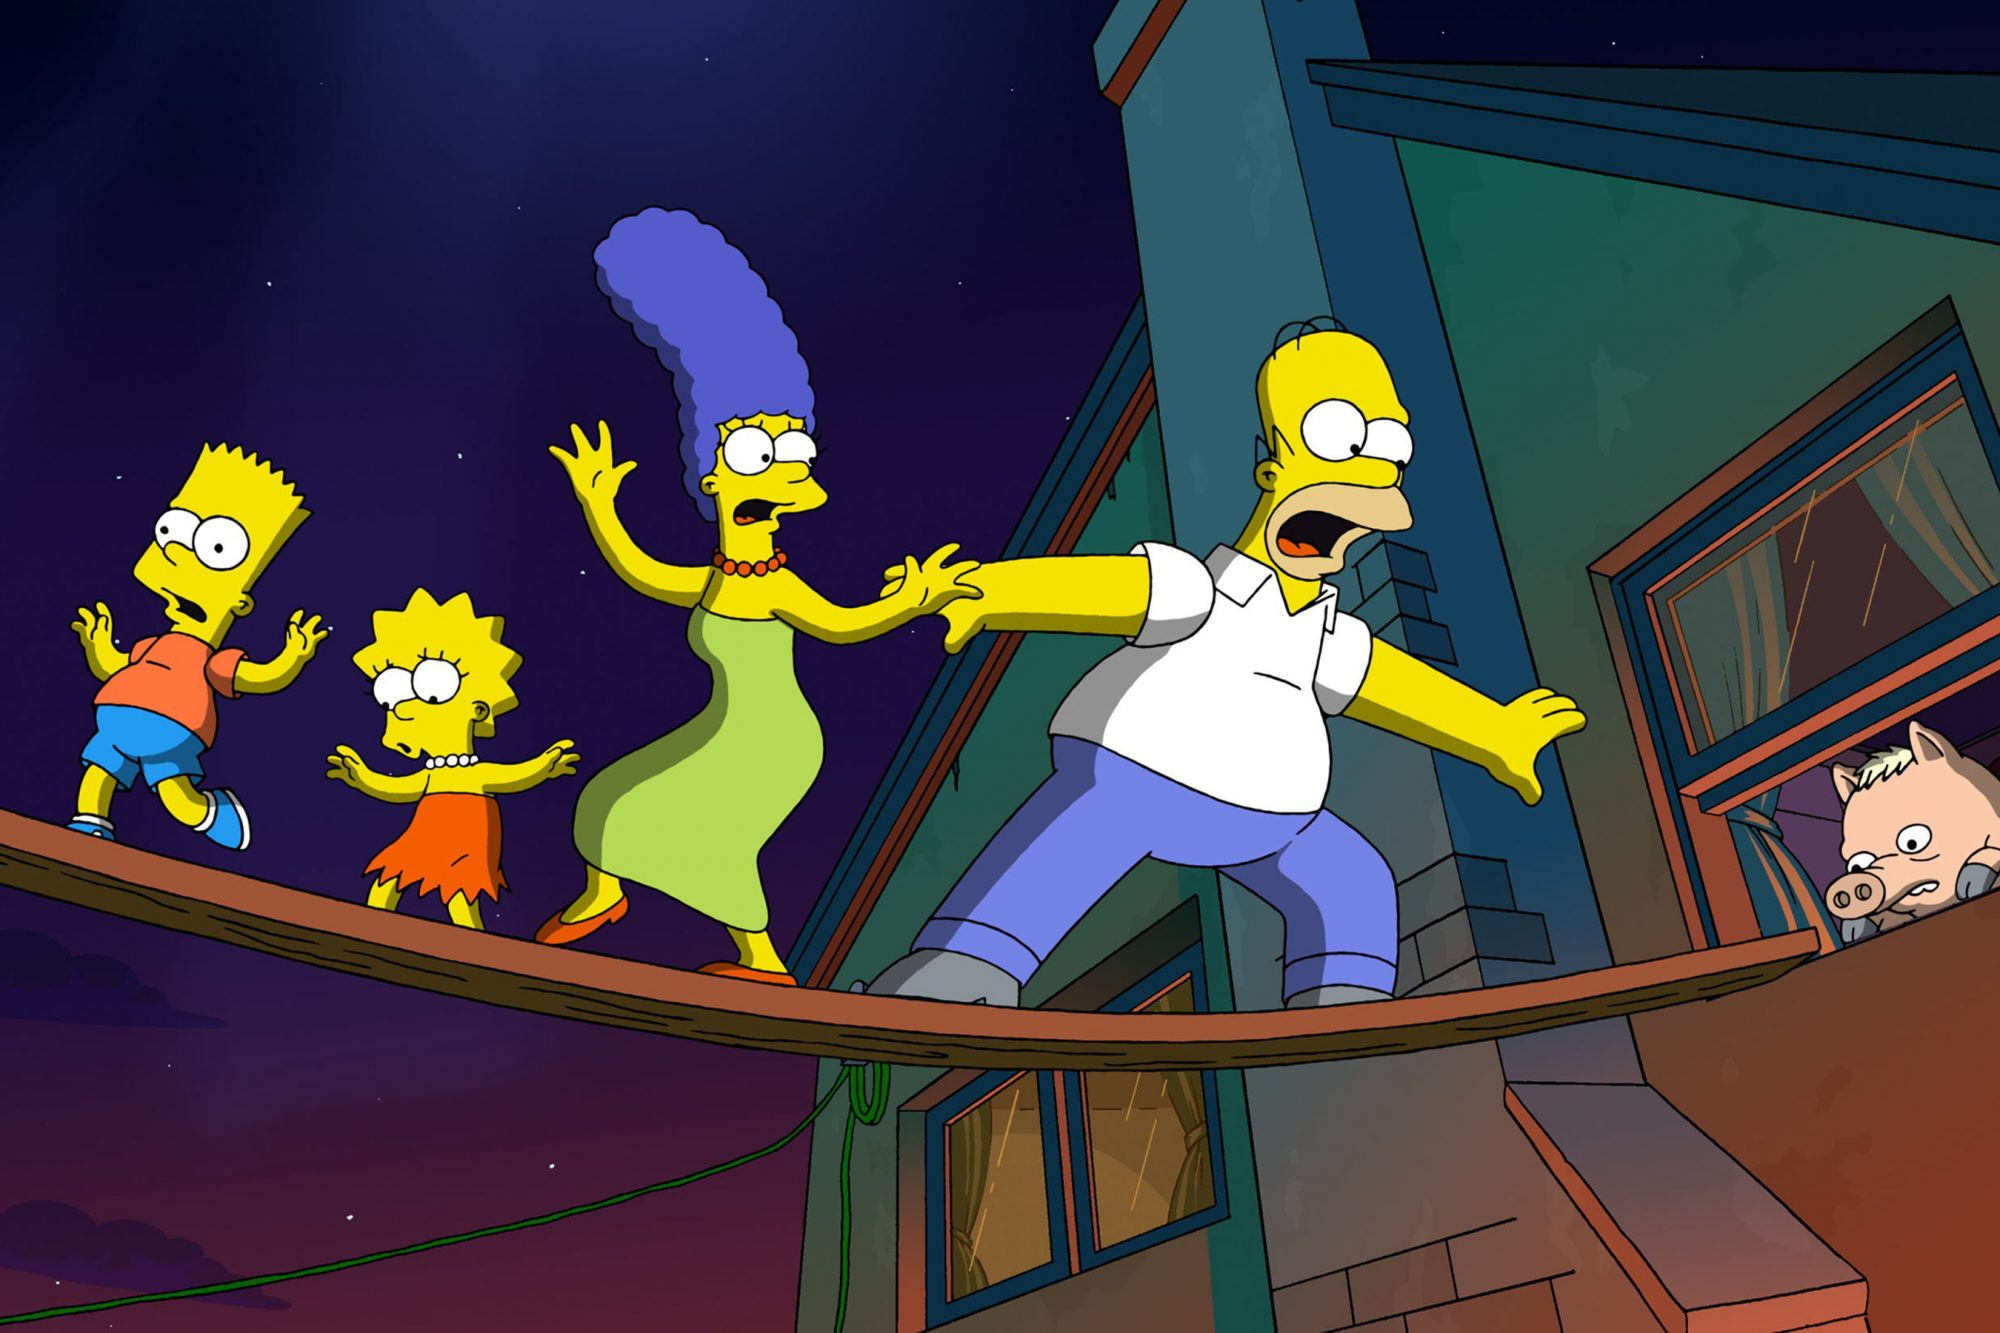 THE SIMPSONS MOVIE, Maggie Simpson, Bart Simpson (voice: Nancy Cartwright), Lisa Simpson (voice: Yea